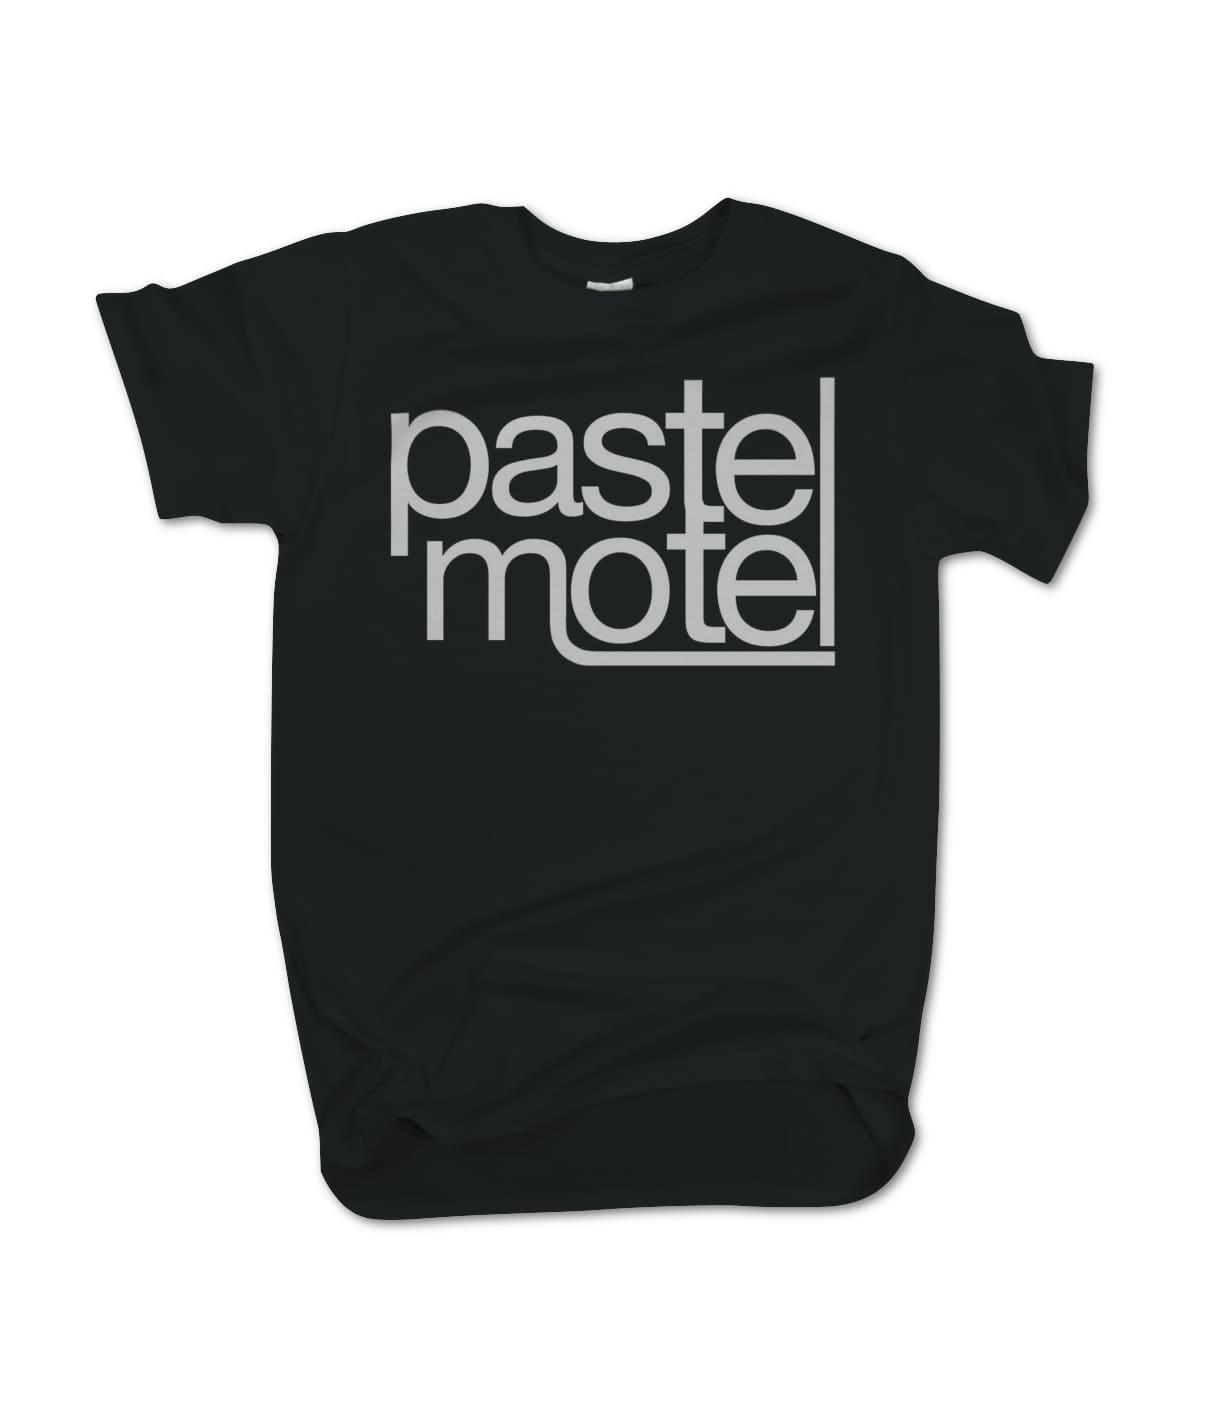 Pastel motel classic